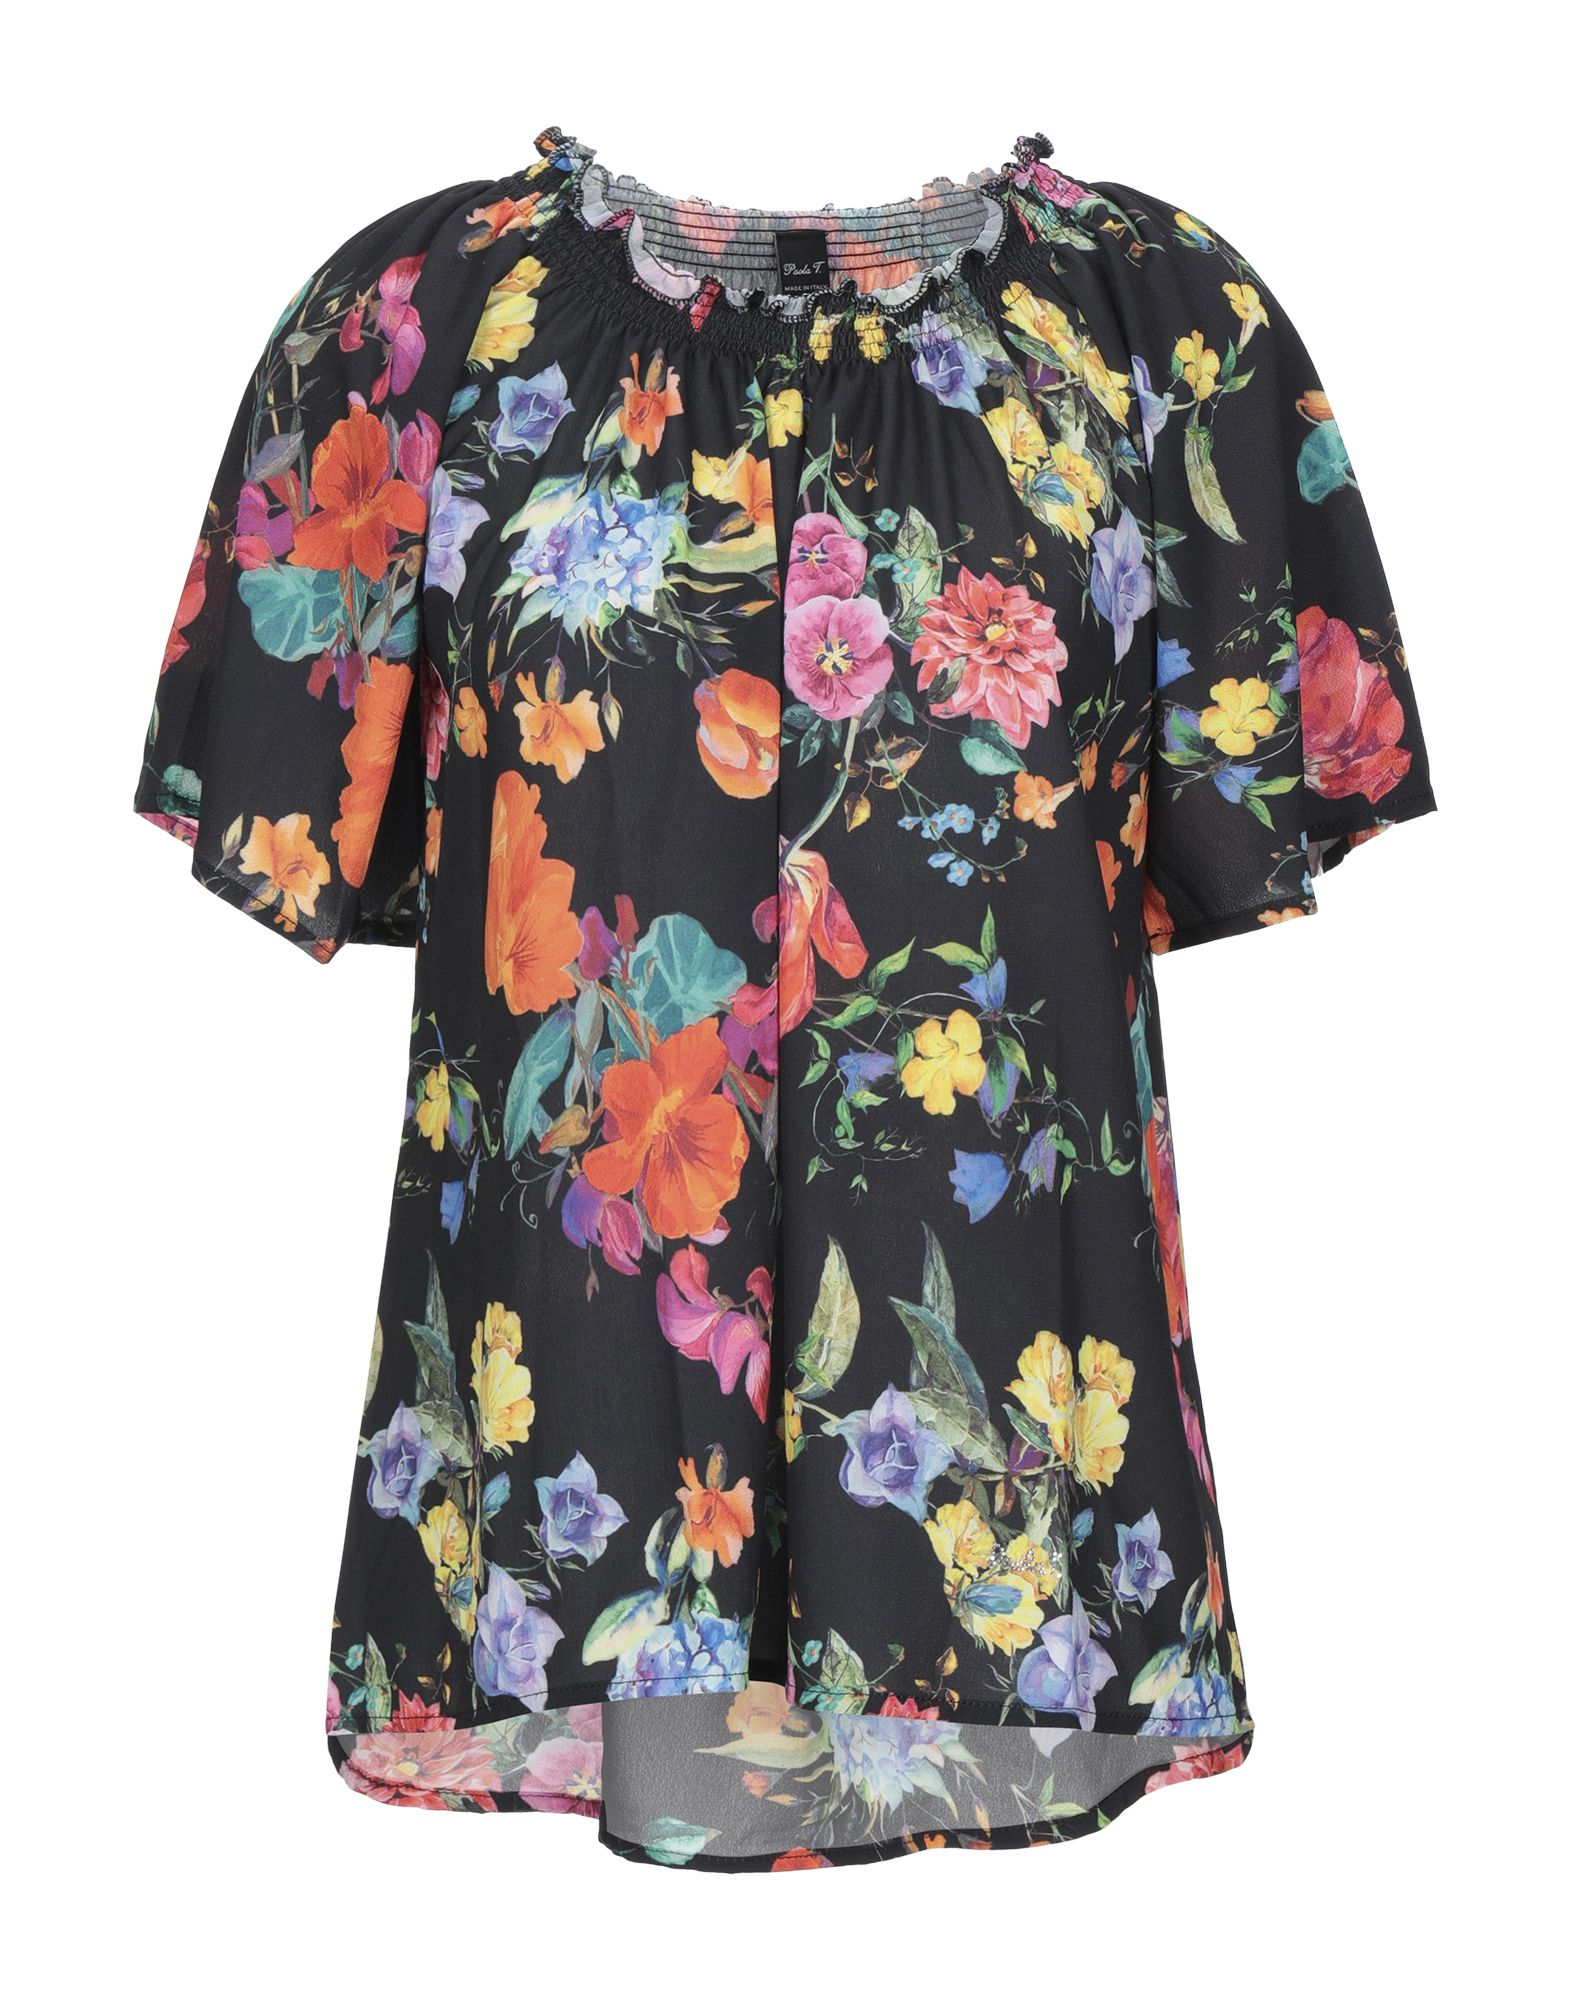 PAOLA T. Блузка блузка paola klingel цвет фиолетовый рисунок